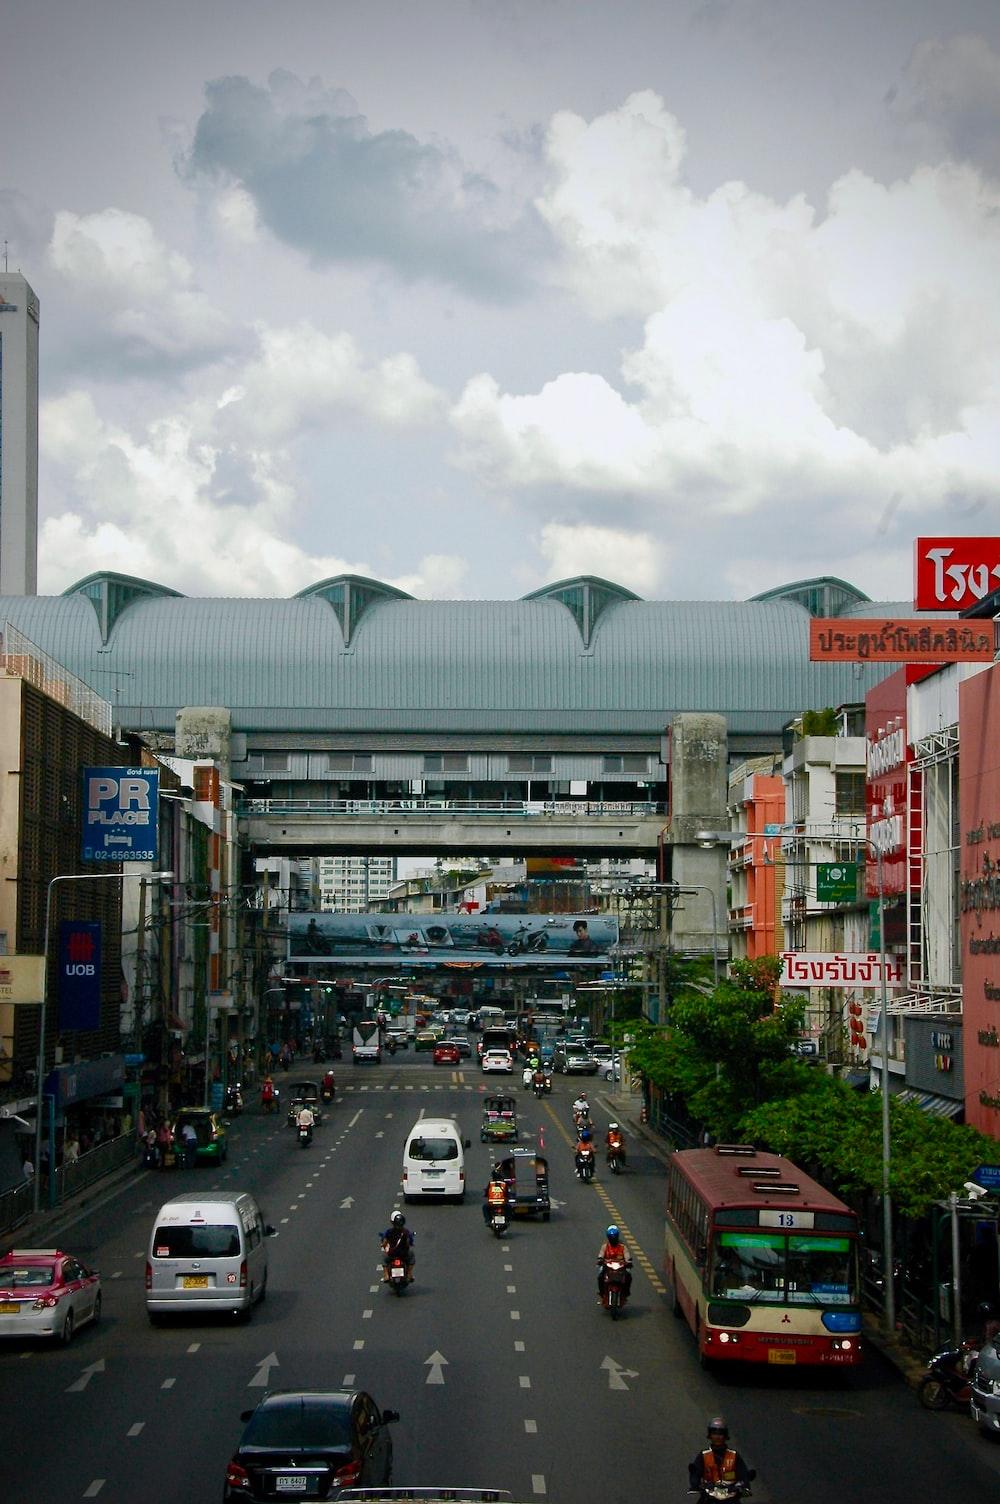 Bangkok, water gate, pra to num and inner city bangkok | HD photo by